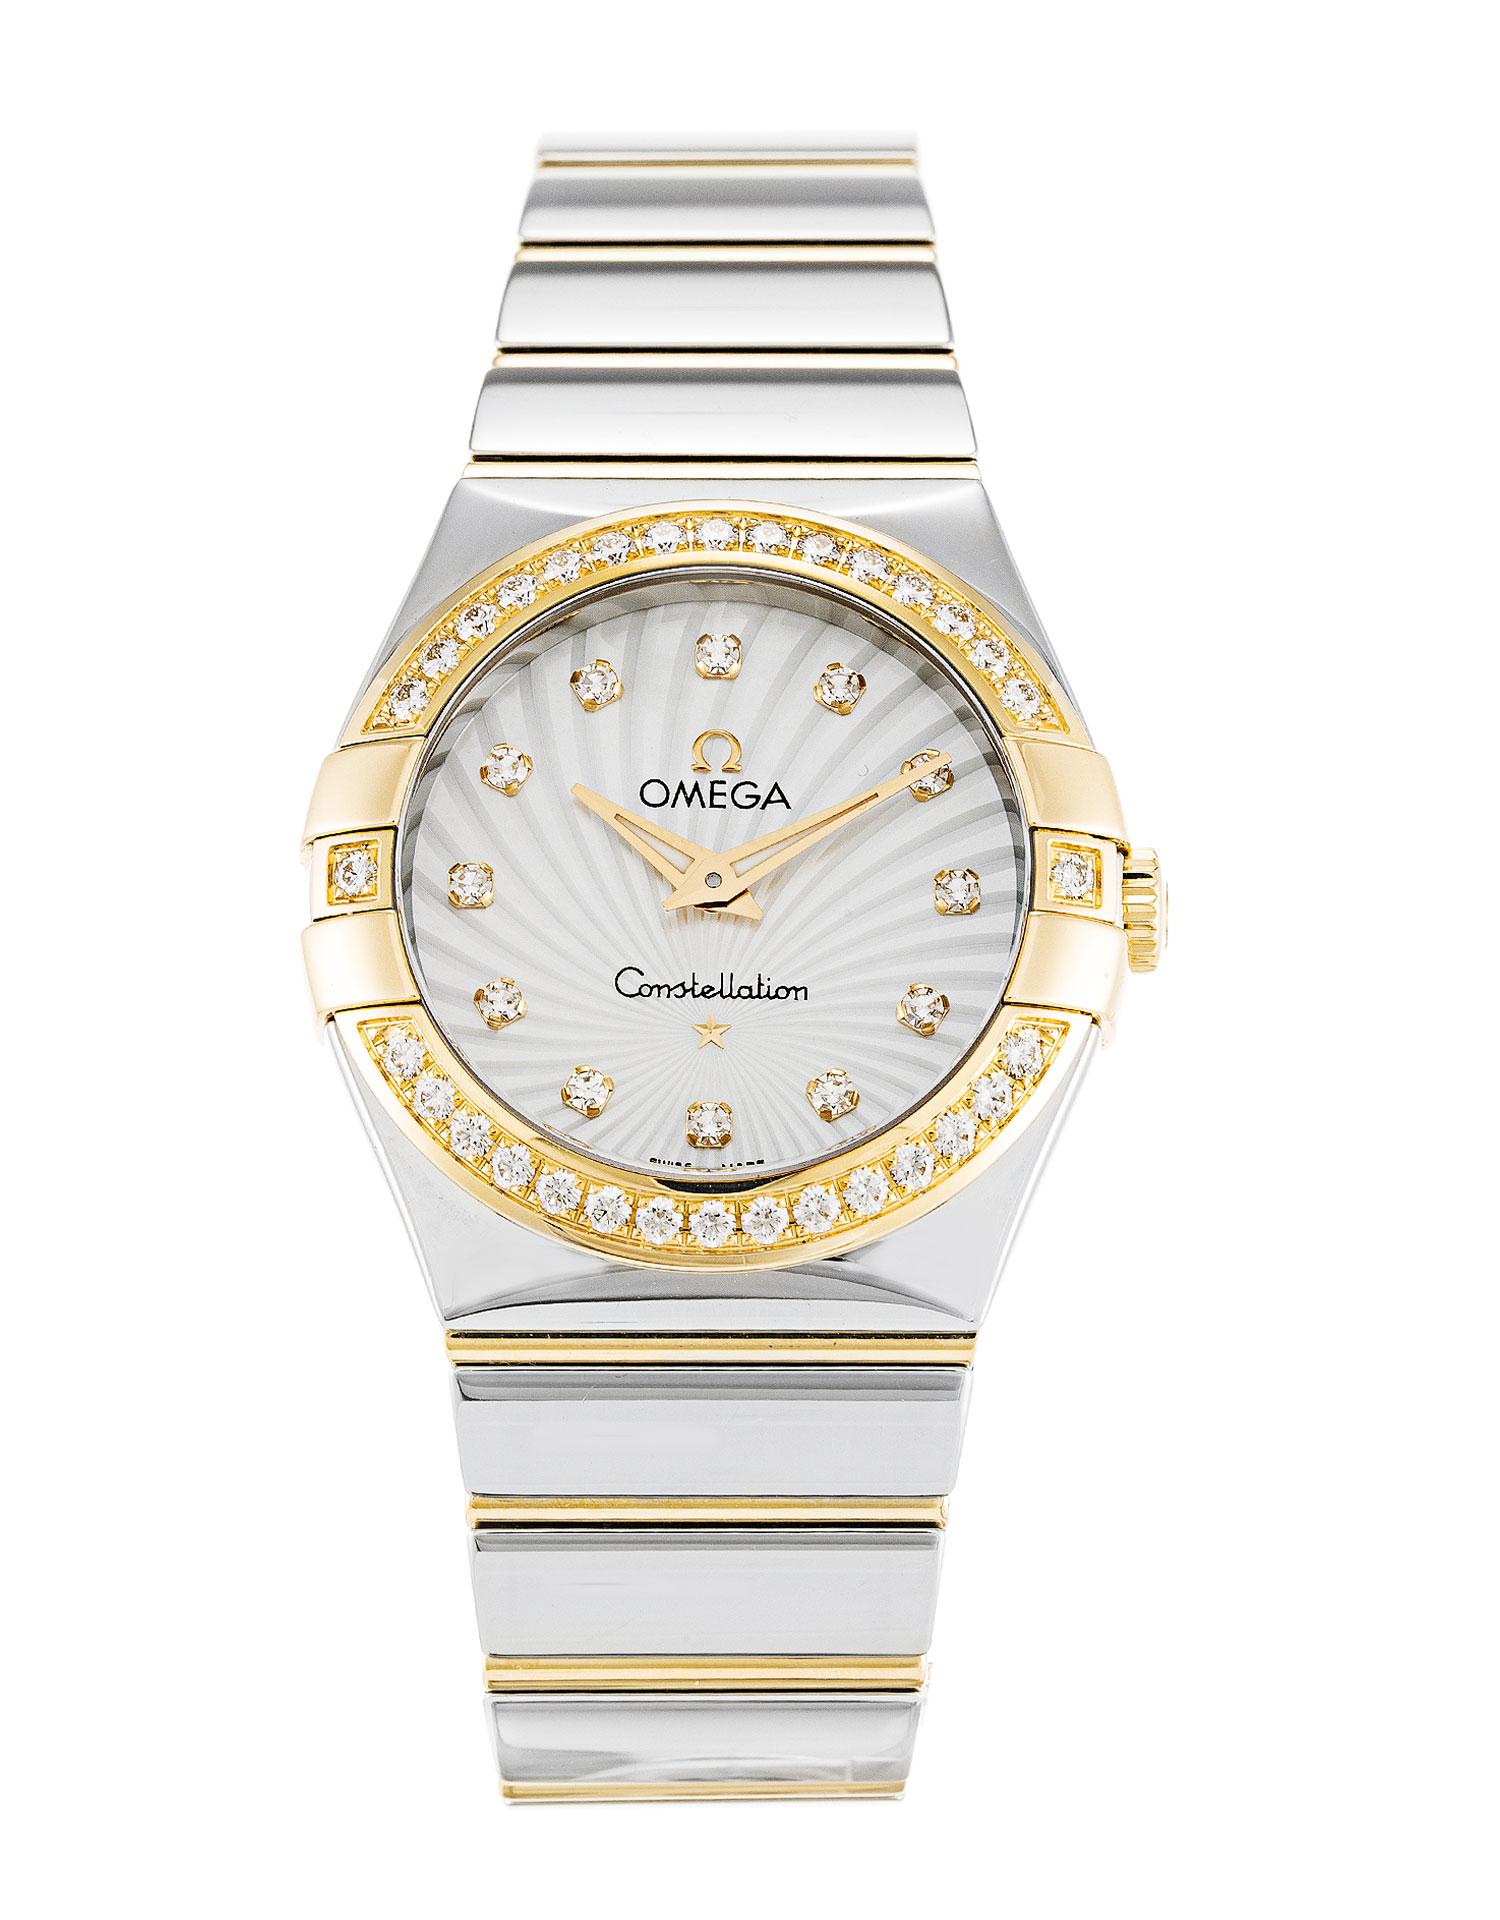 Replica watches high quality omega replica watches online for Omega replica watch